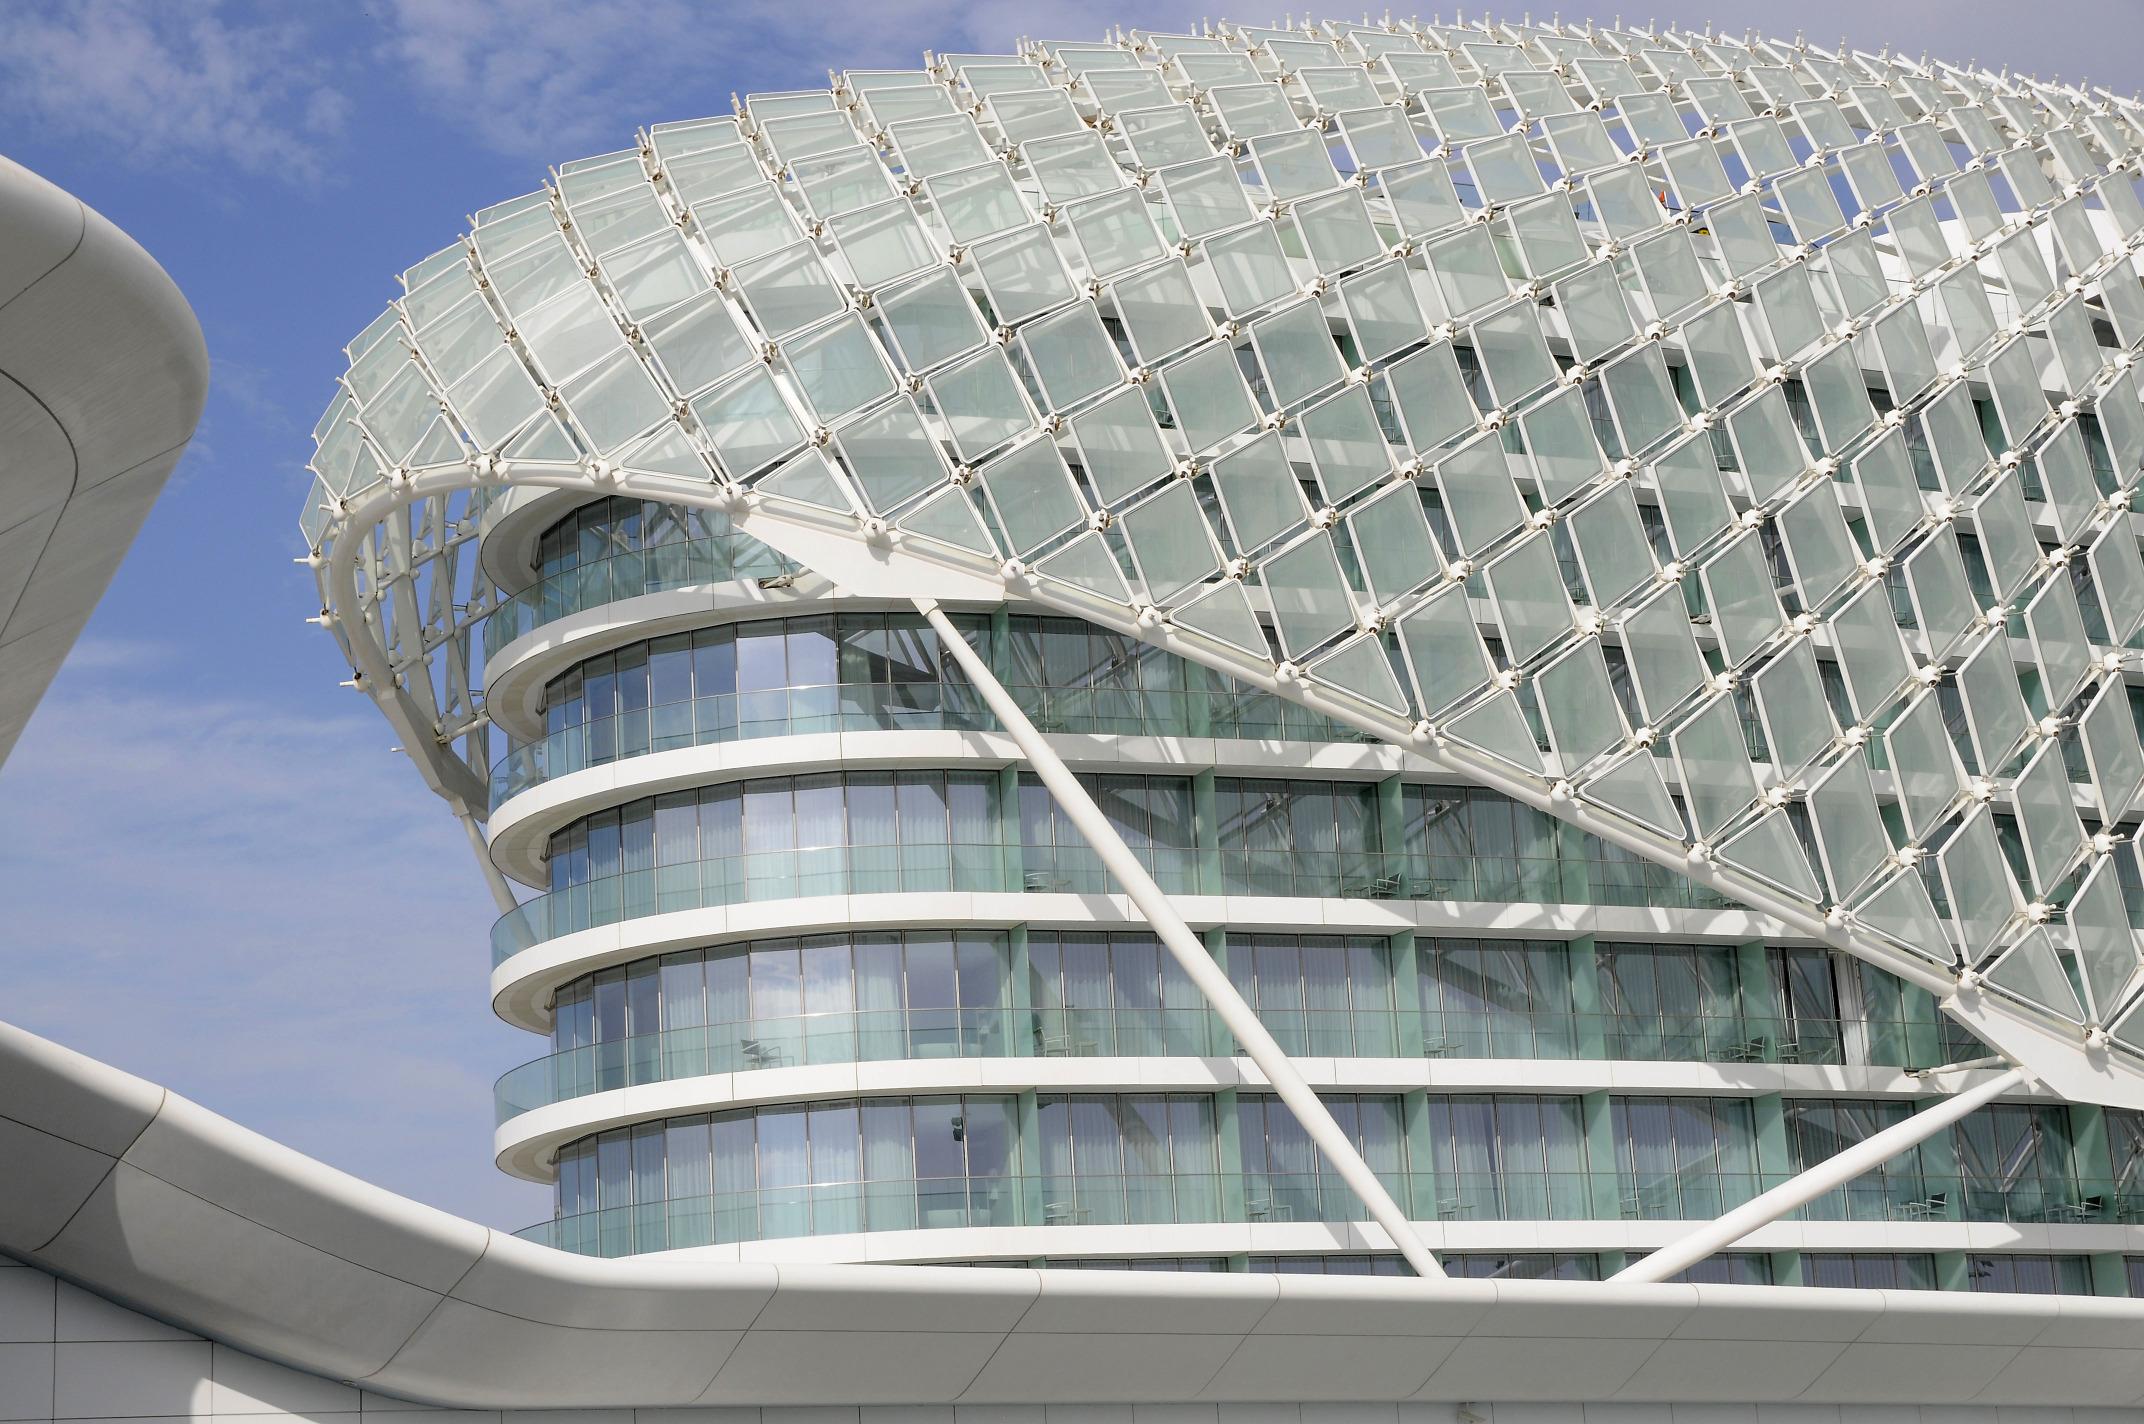 Yas Hotel Abu Dhabi (4)   Abu Dhabi   Pictures   United ...